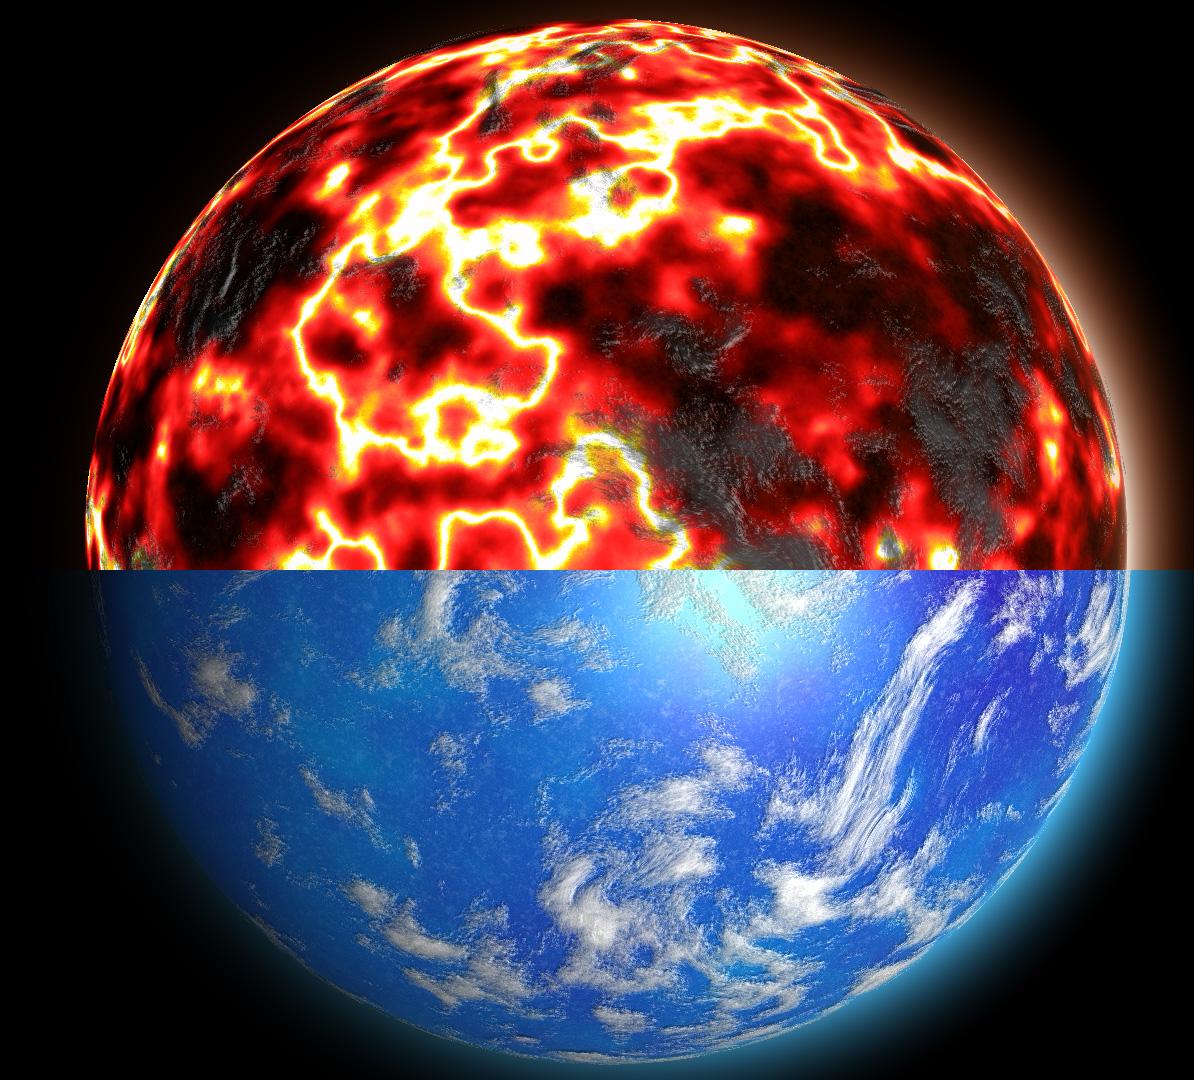 sphere_perlin_noise005 | Текстура планеты. Хотел как лучше...